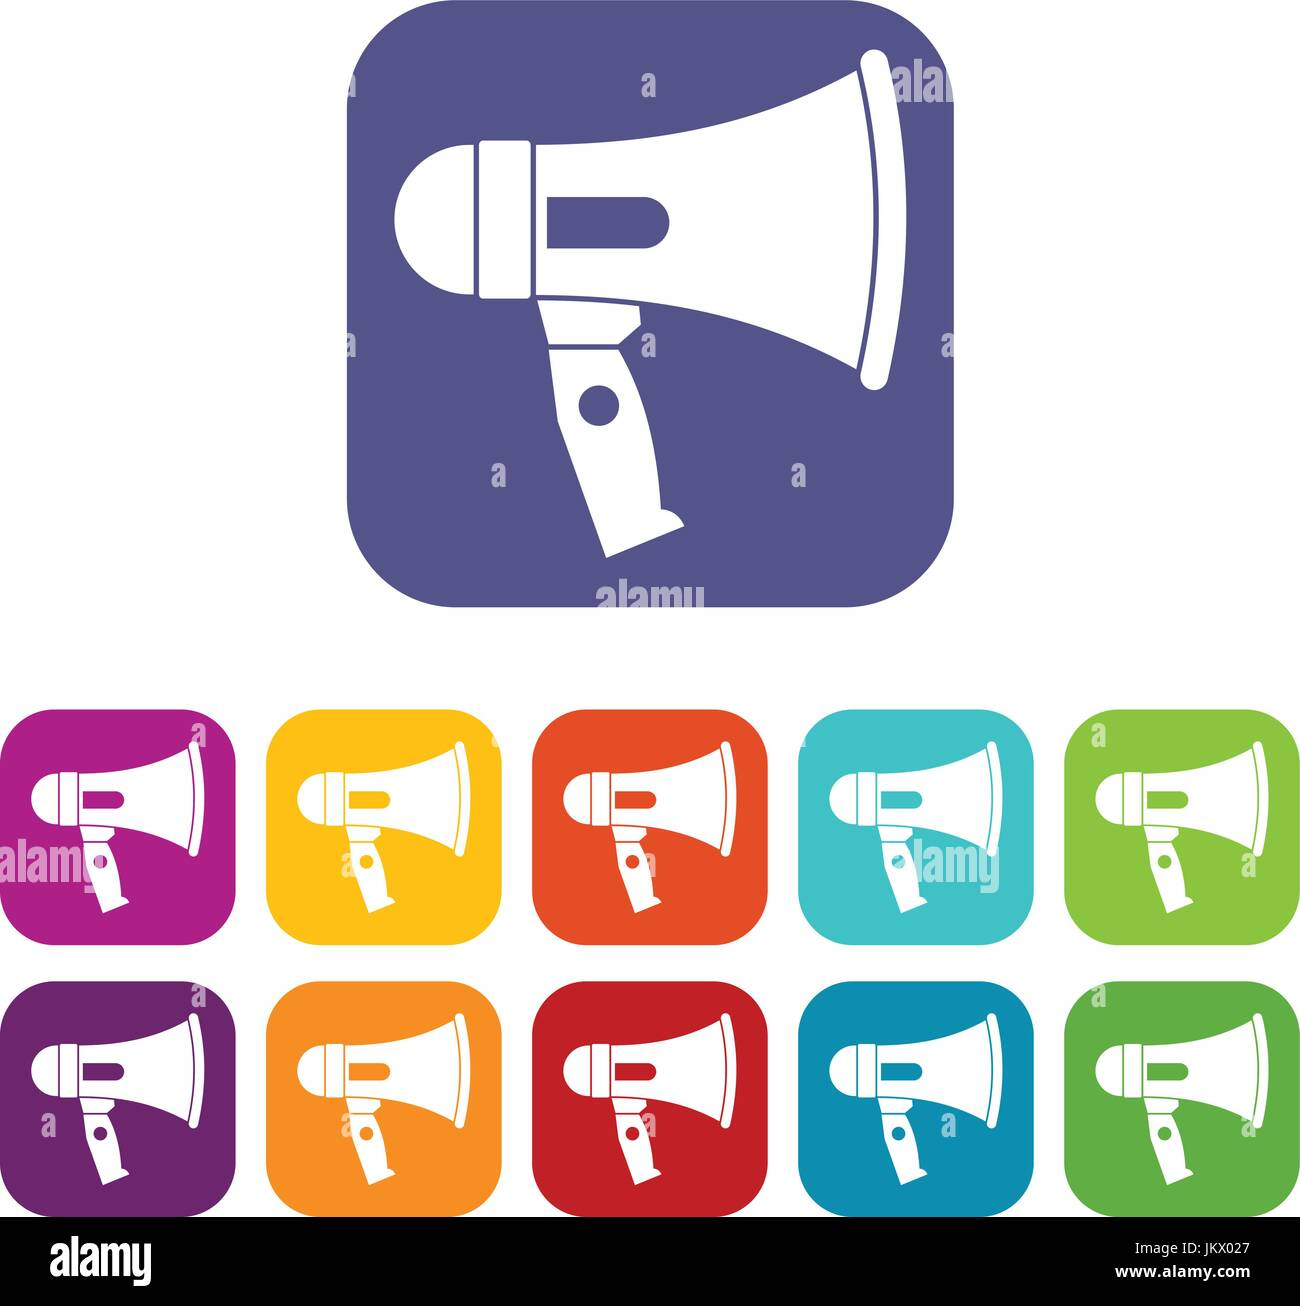 Mouthpiece icons set - Stock Image